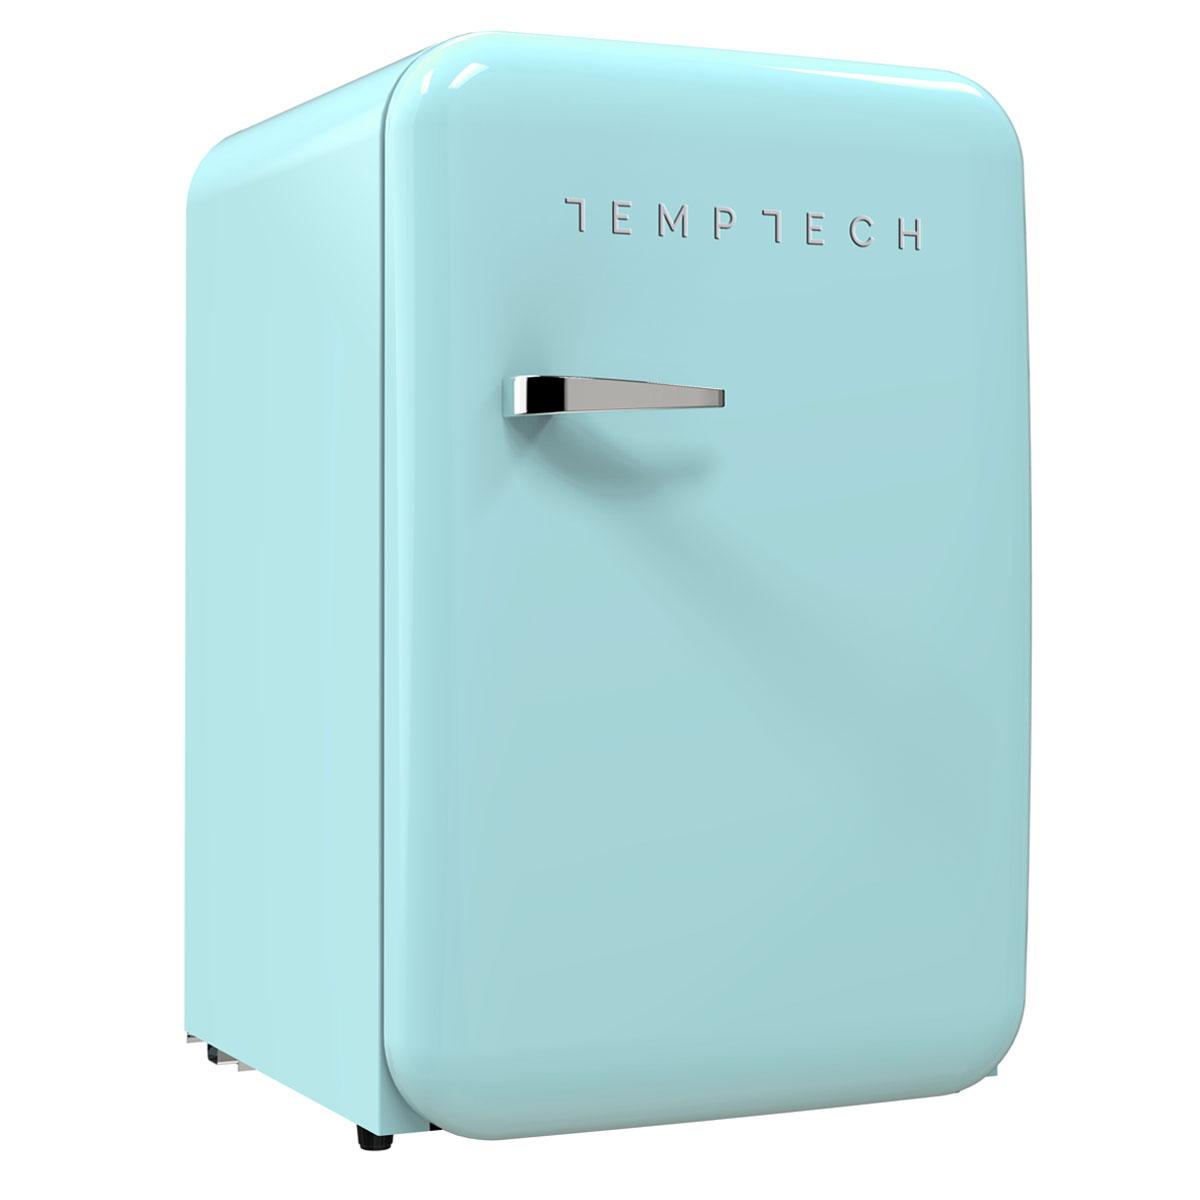 9a38bfd1 HRF130RLBLUE retro kylskåp - TEMPTECH